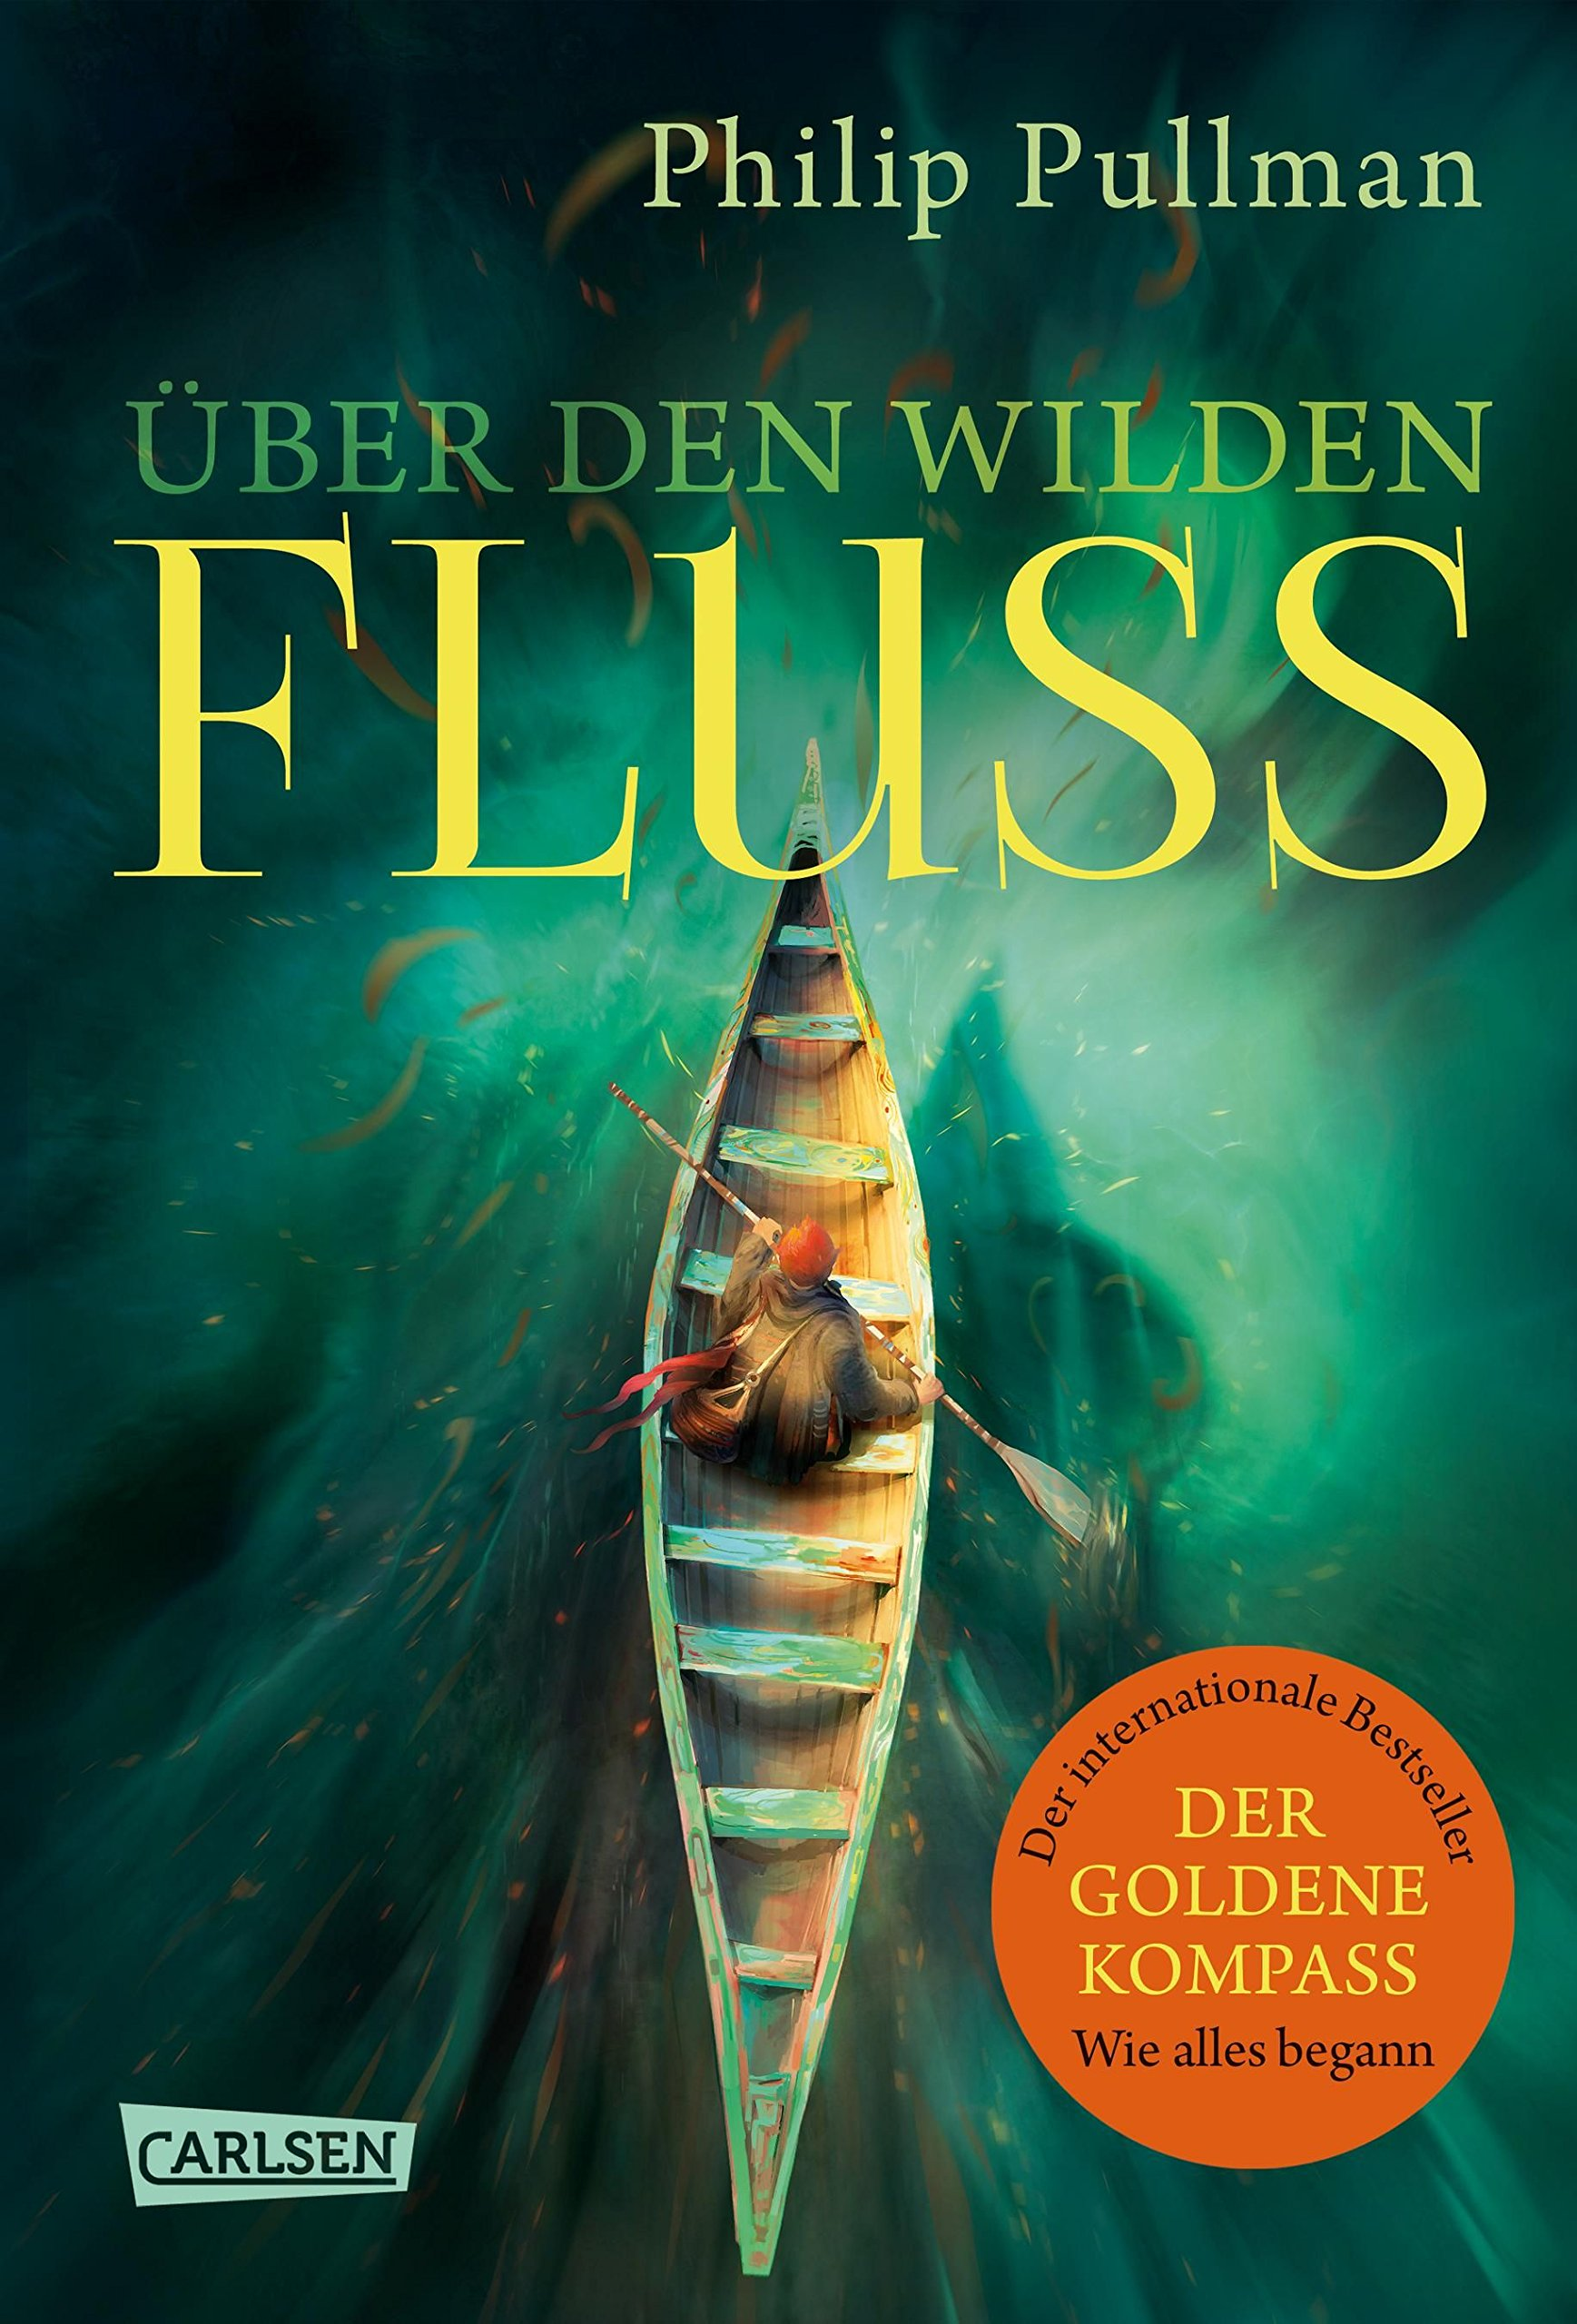 His Dark Materials 0: Über den wilden Fluss Gebundenes Buch – 17. November 2017 Philip Pullman Antoinette Gittinger Carlsen 3551583935